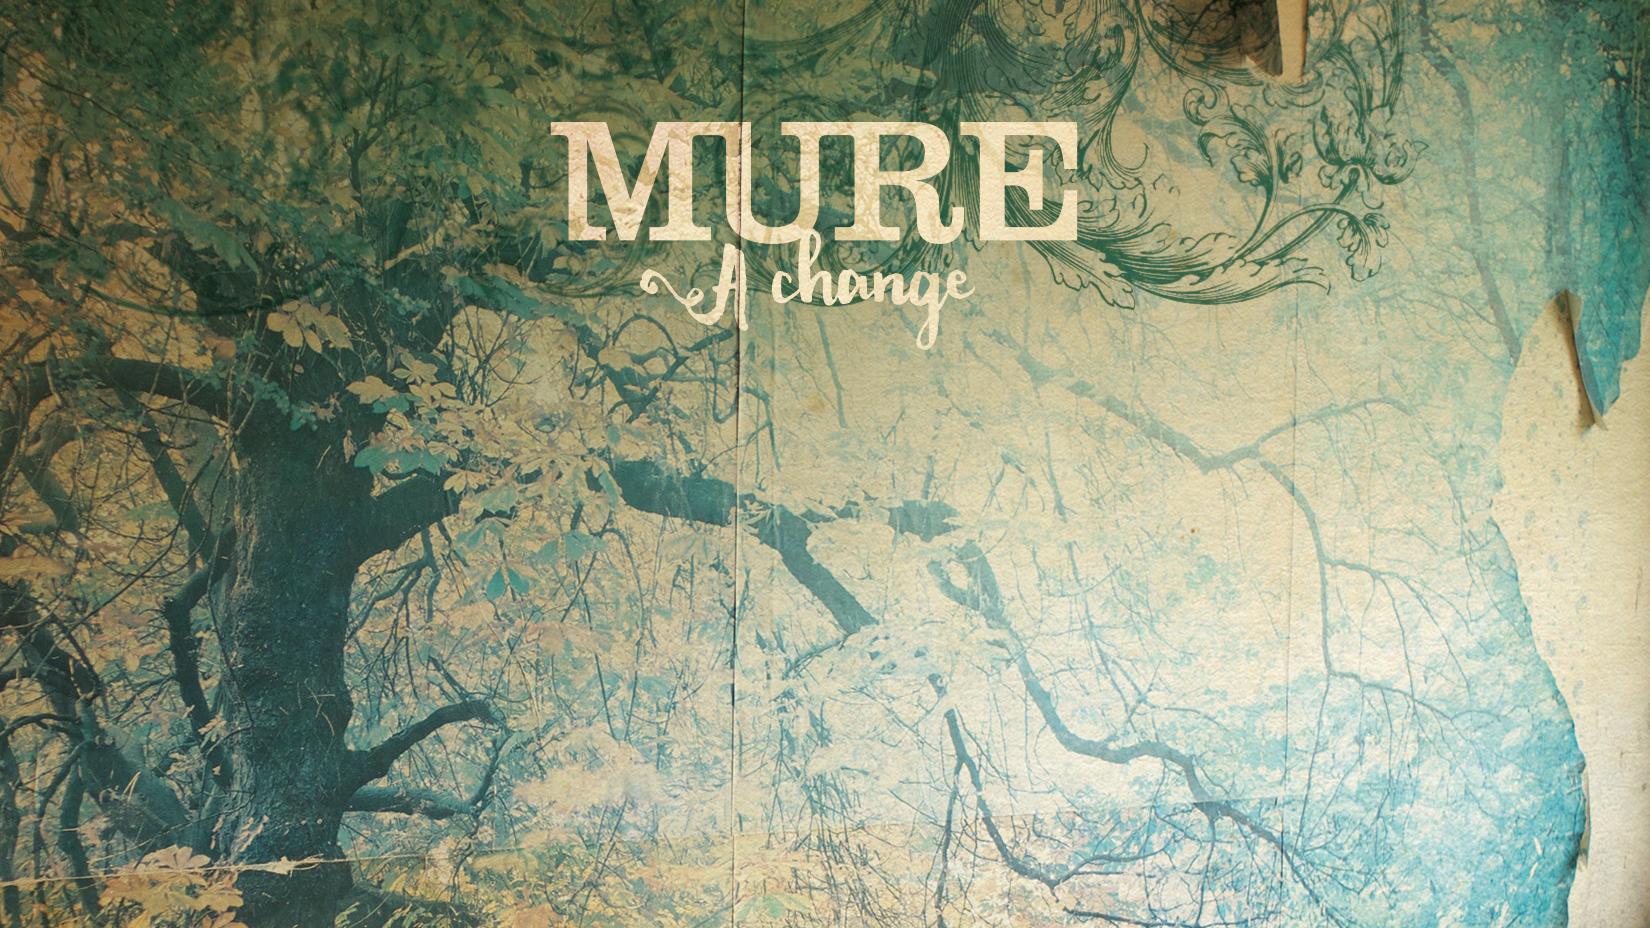 MURE-a_change-couv_digipack-1516734550.jpg